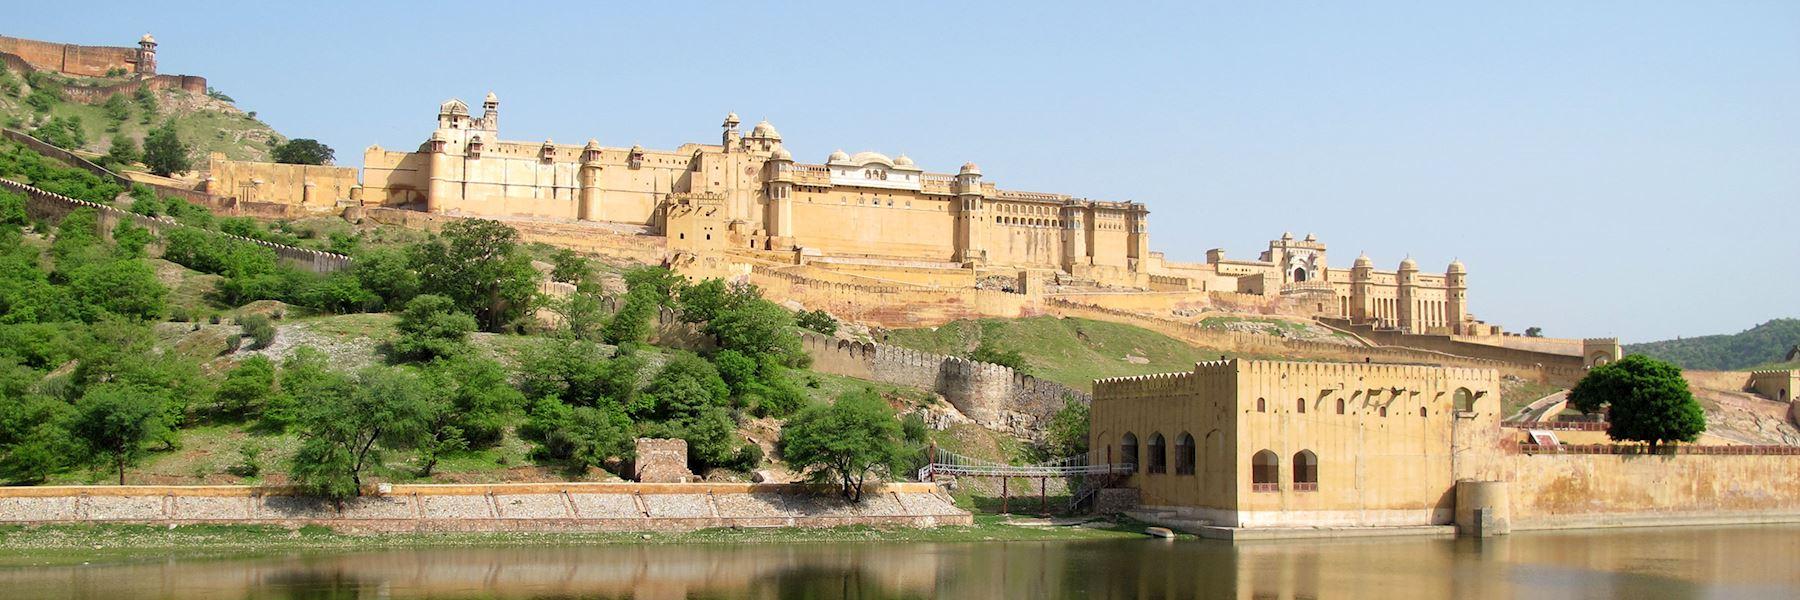 Visit Jaipur, India